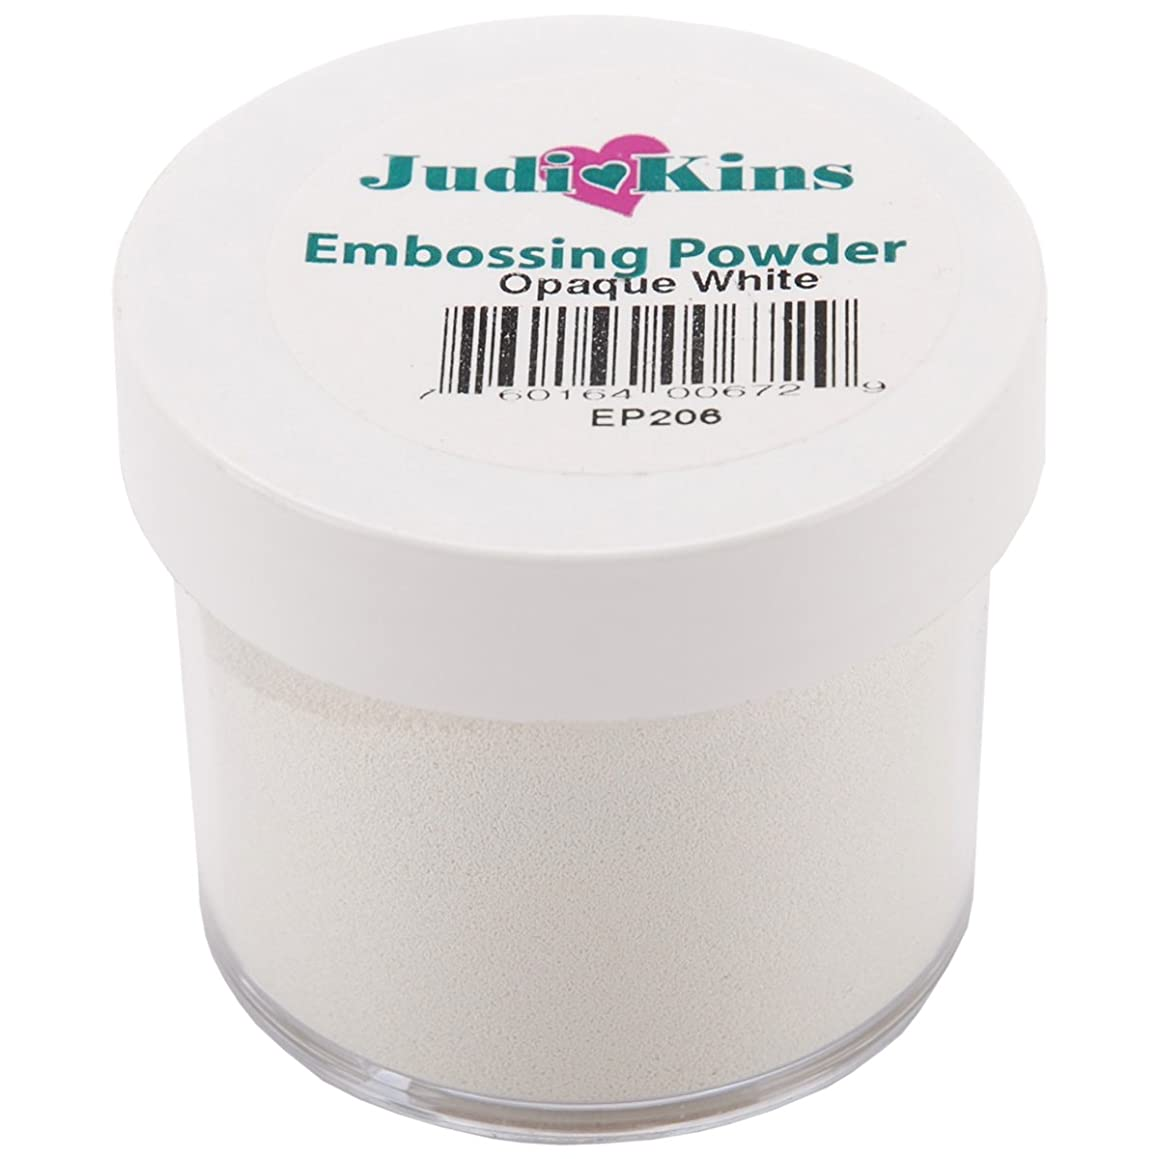 Judikins EP2-06 Embossing Powder, 2-Ounce, Opaque White